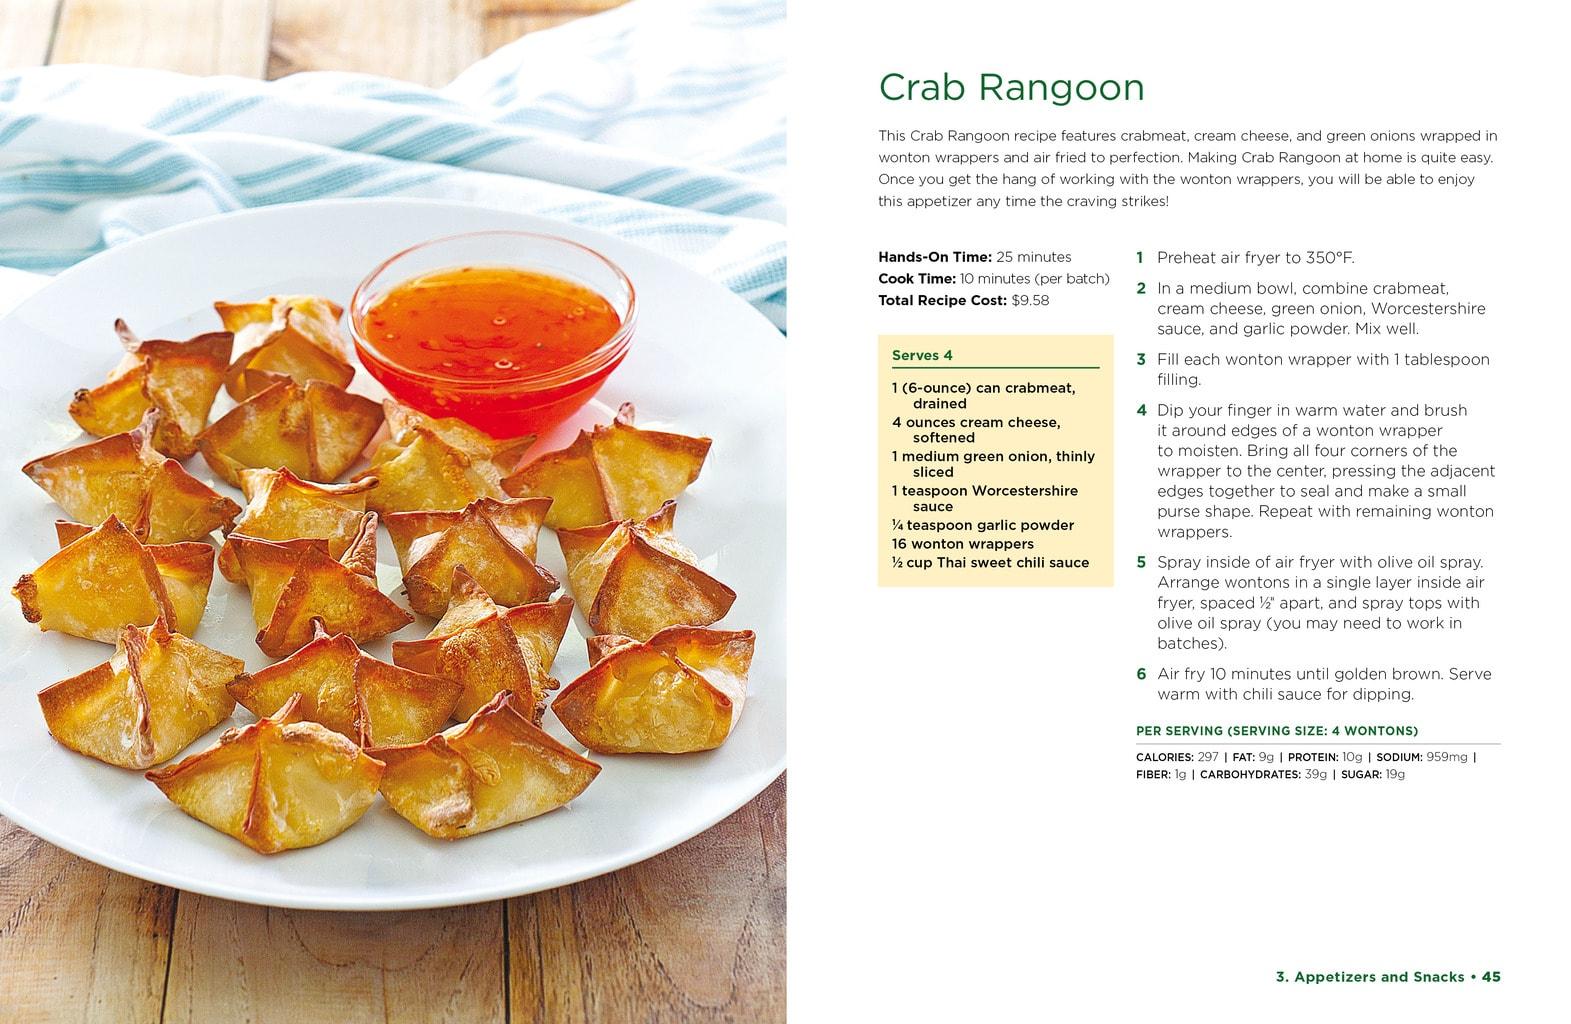 Image of air fryer crab rangoon next to recipe